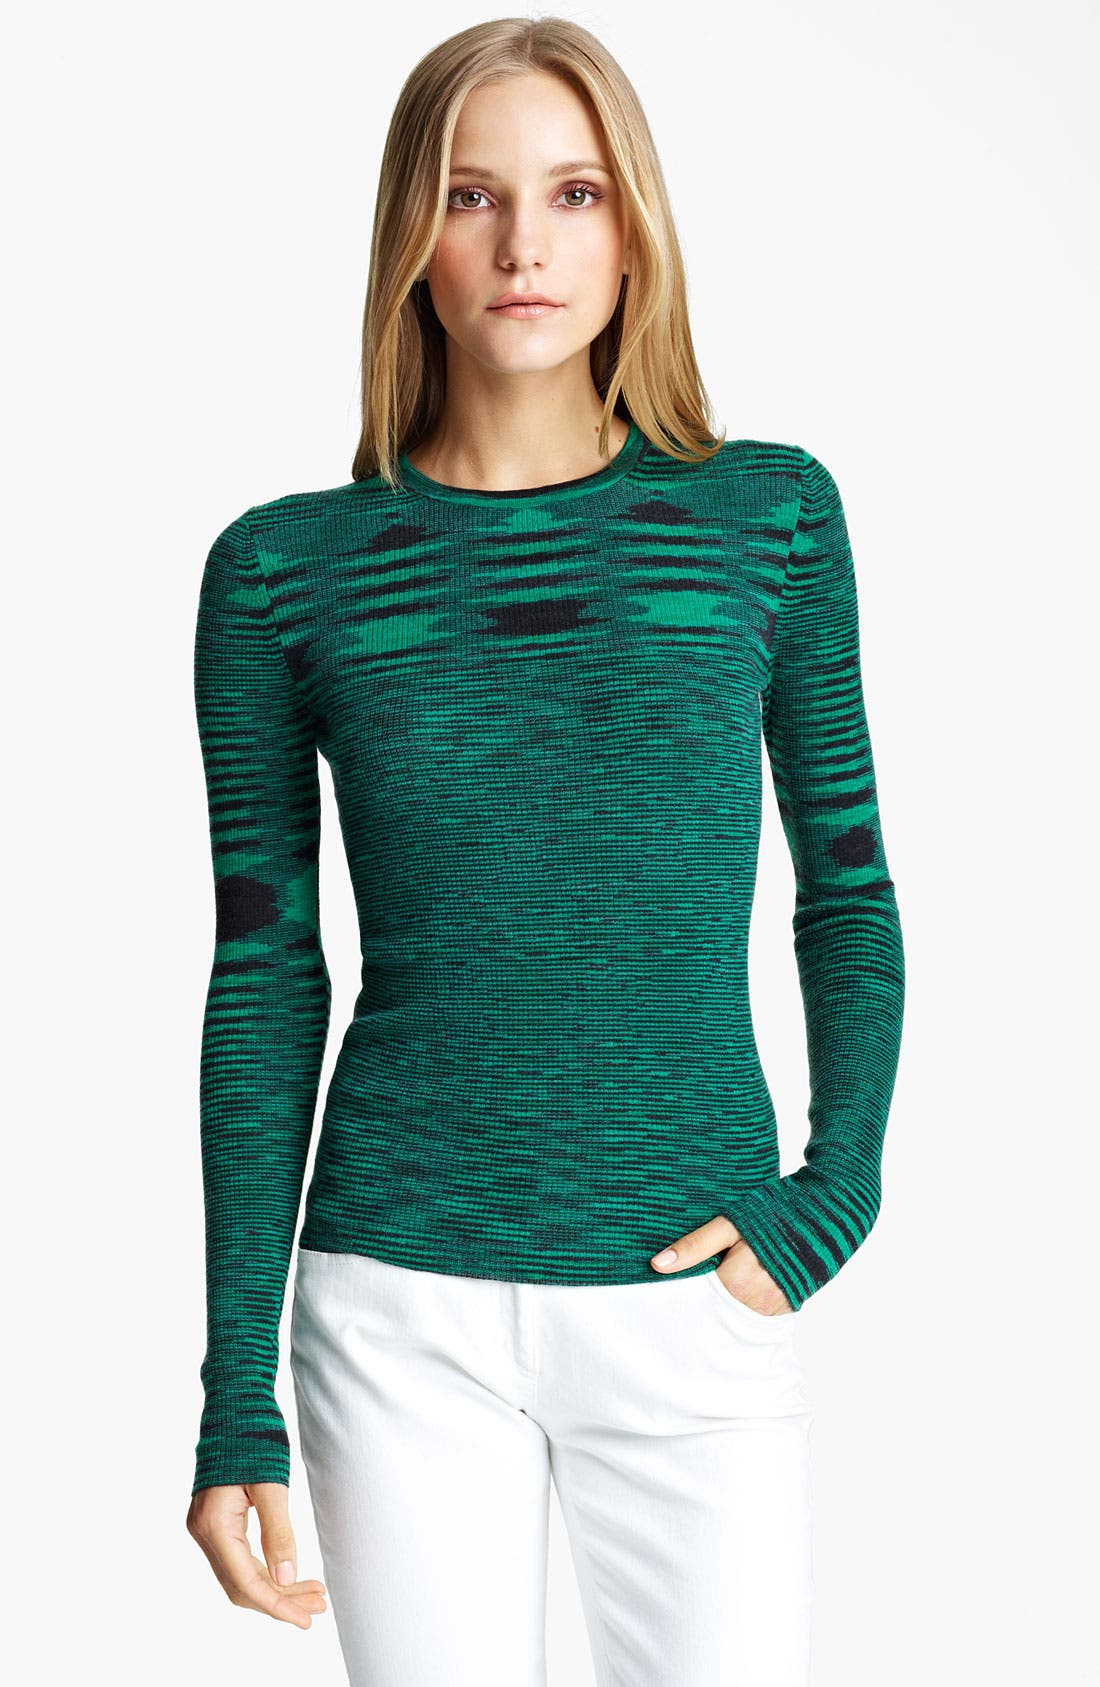 Main Image - Michael Kors Space Dye Cashmere Sweater